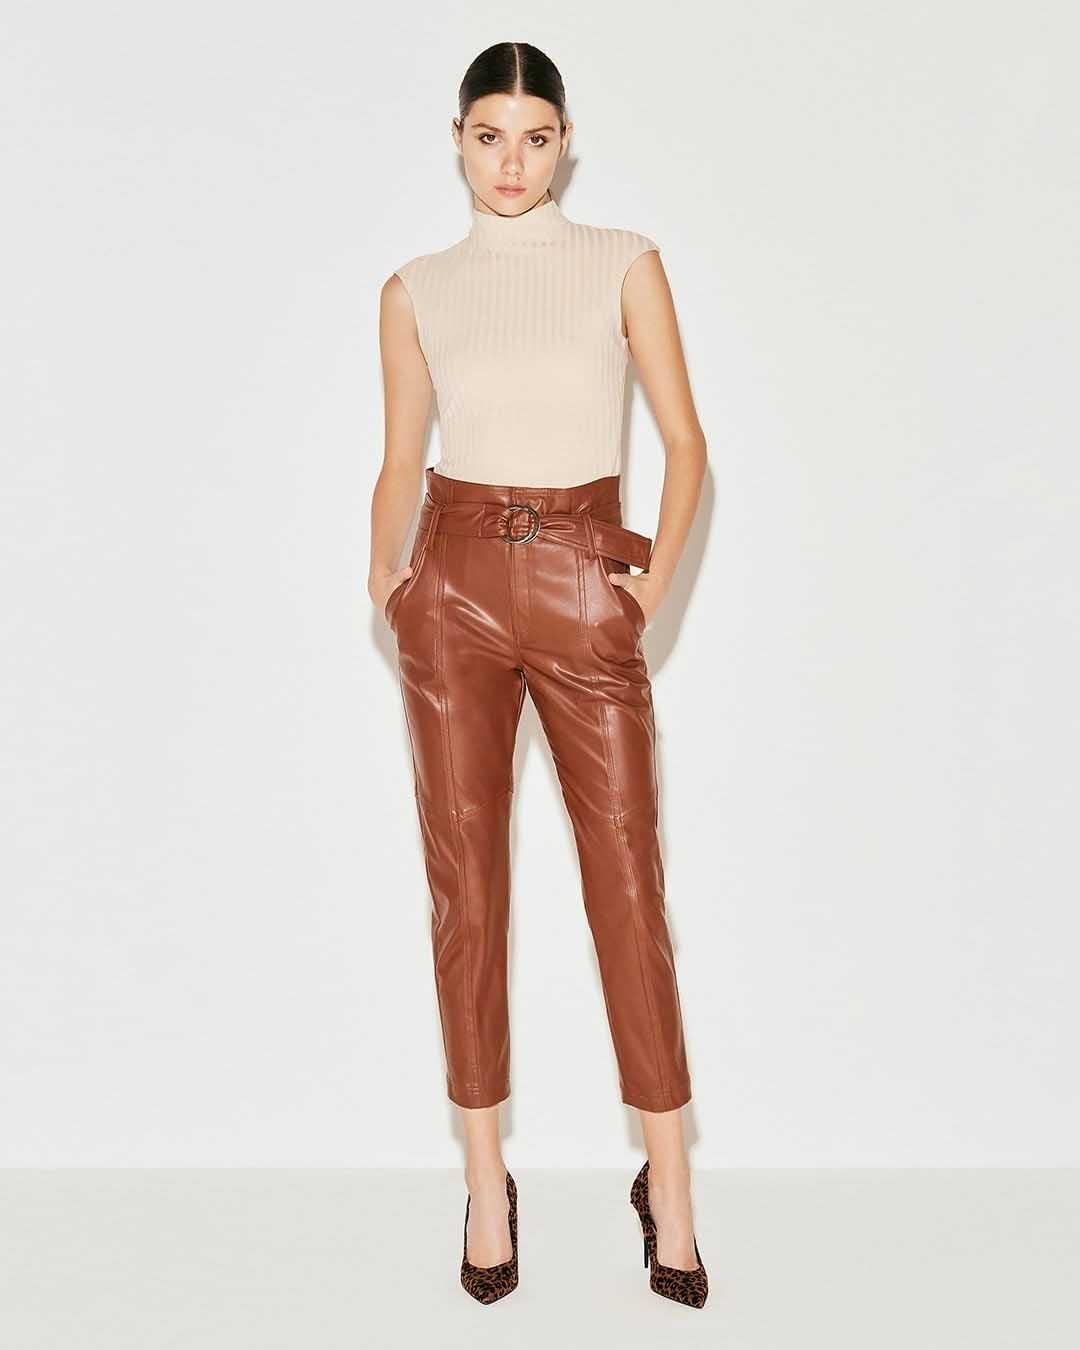 pantalones invierno 2021 moda mujer